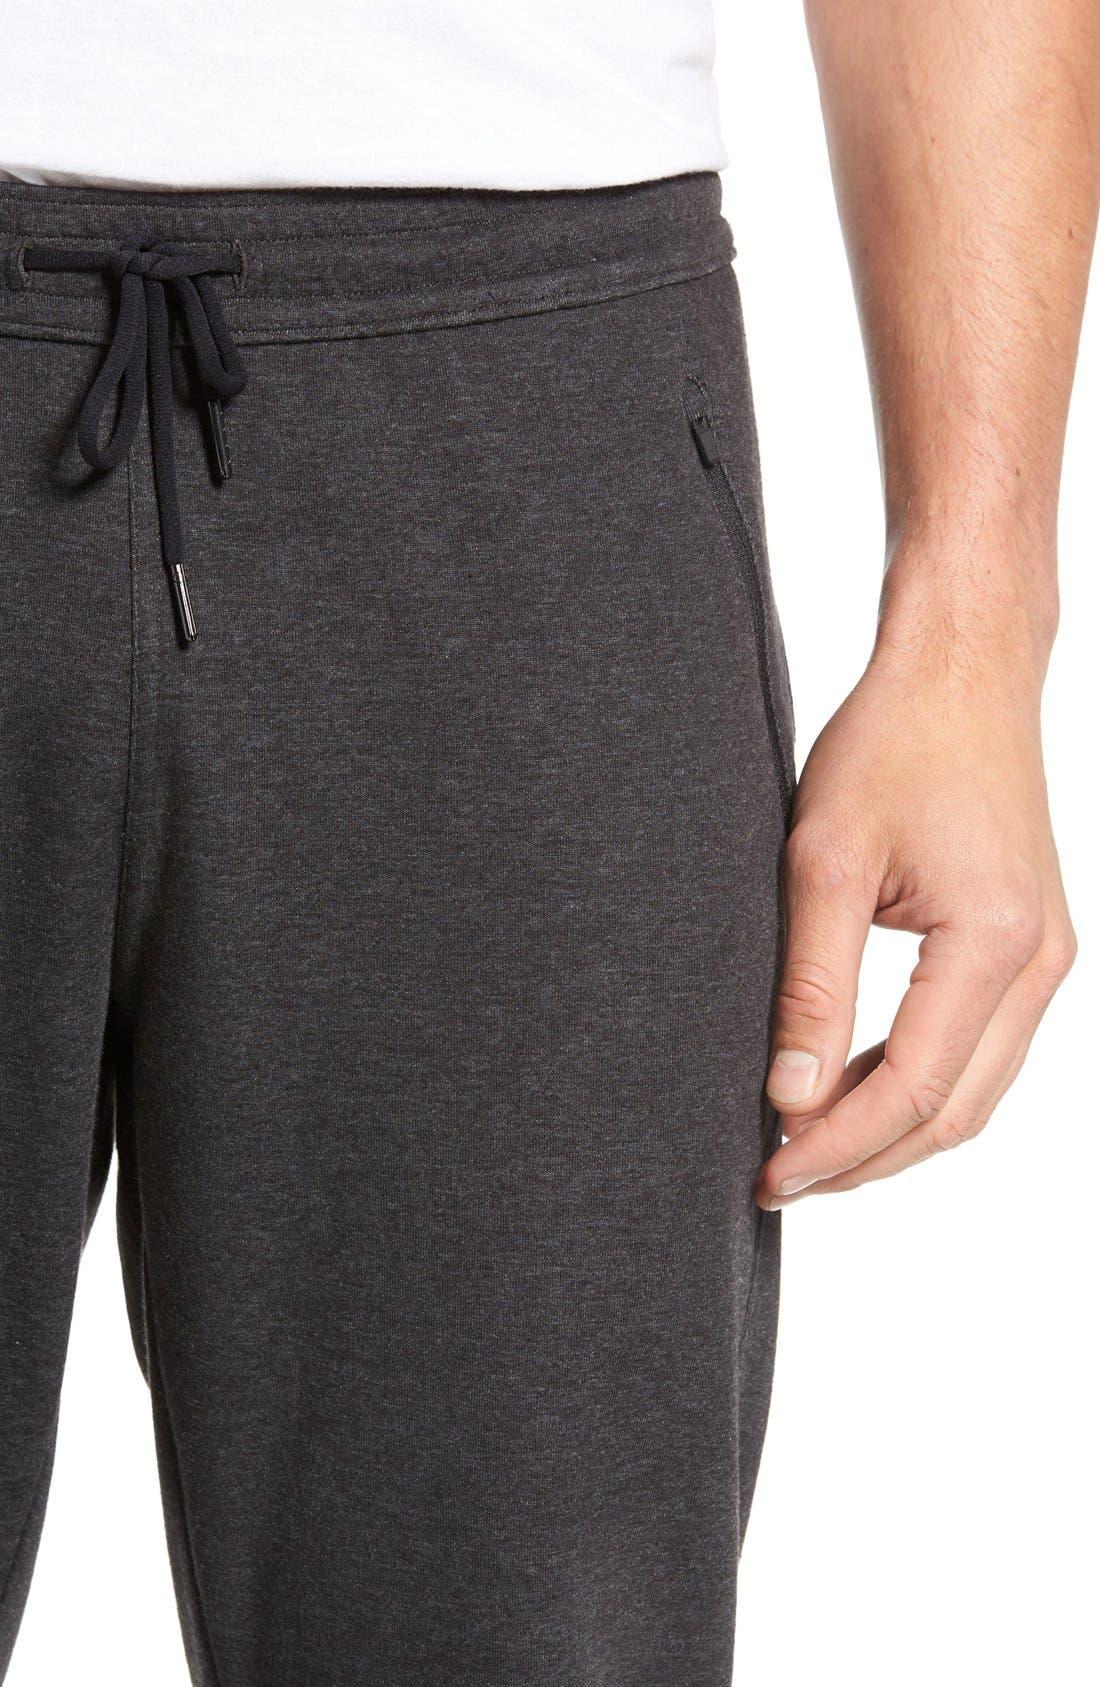 Jogger Pants,                             Alternate thumbnail 4, color,                             001